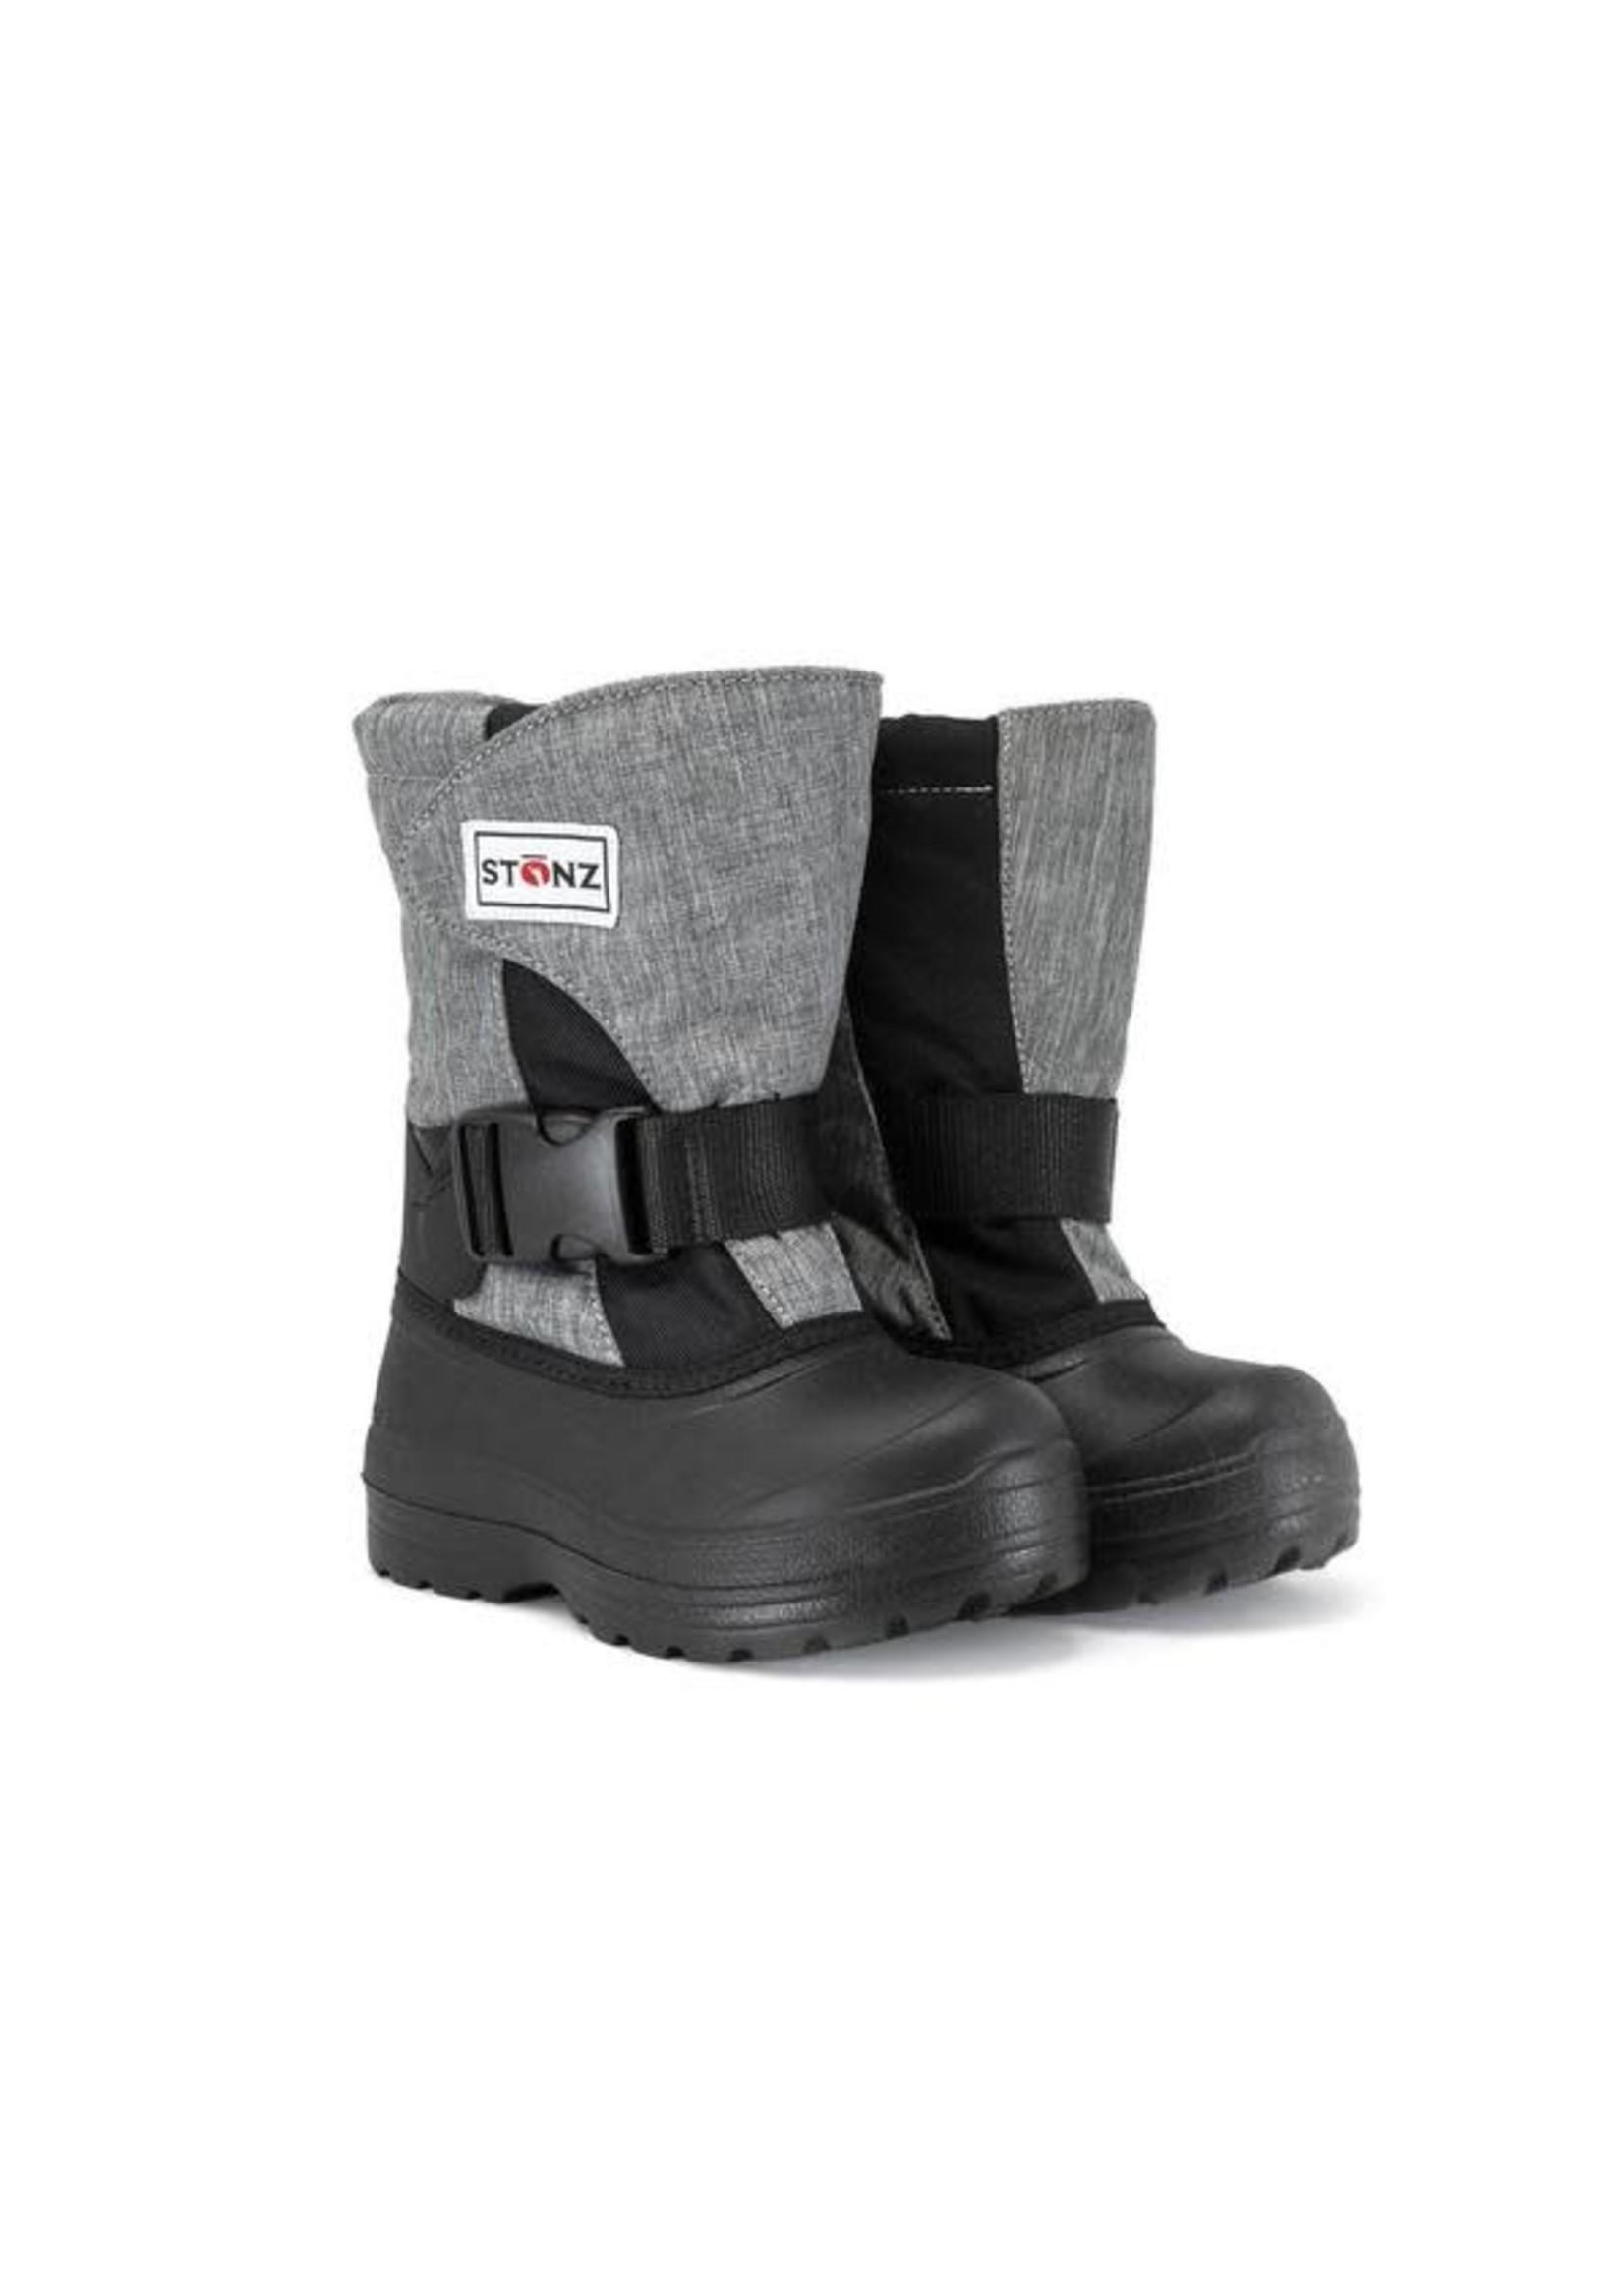 Stonz Trek Boots Heather Grey